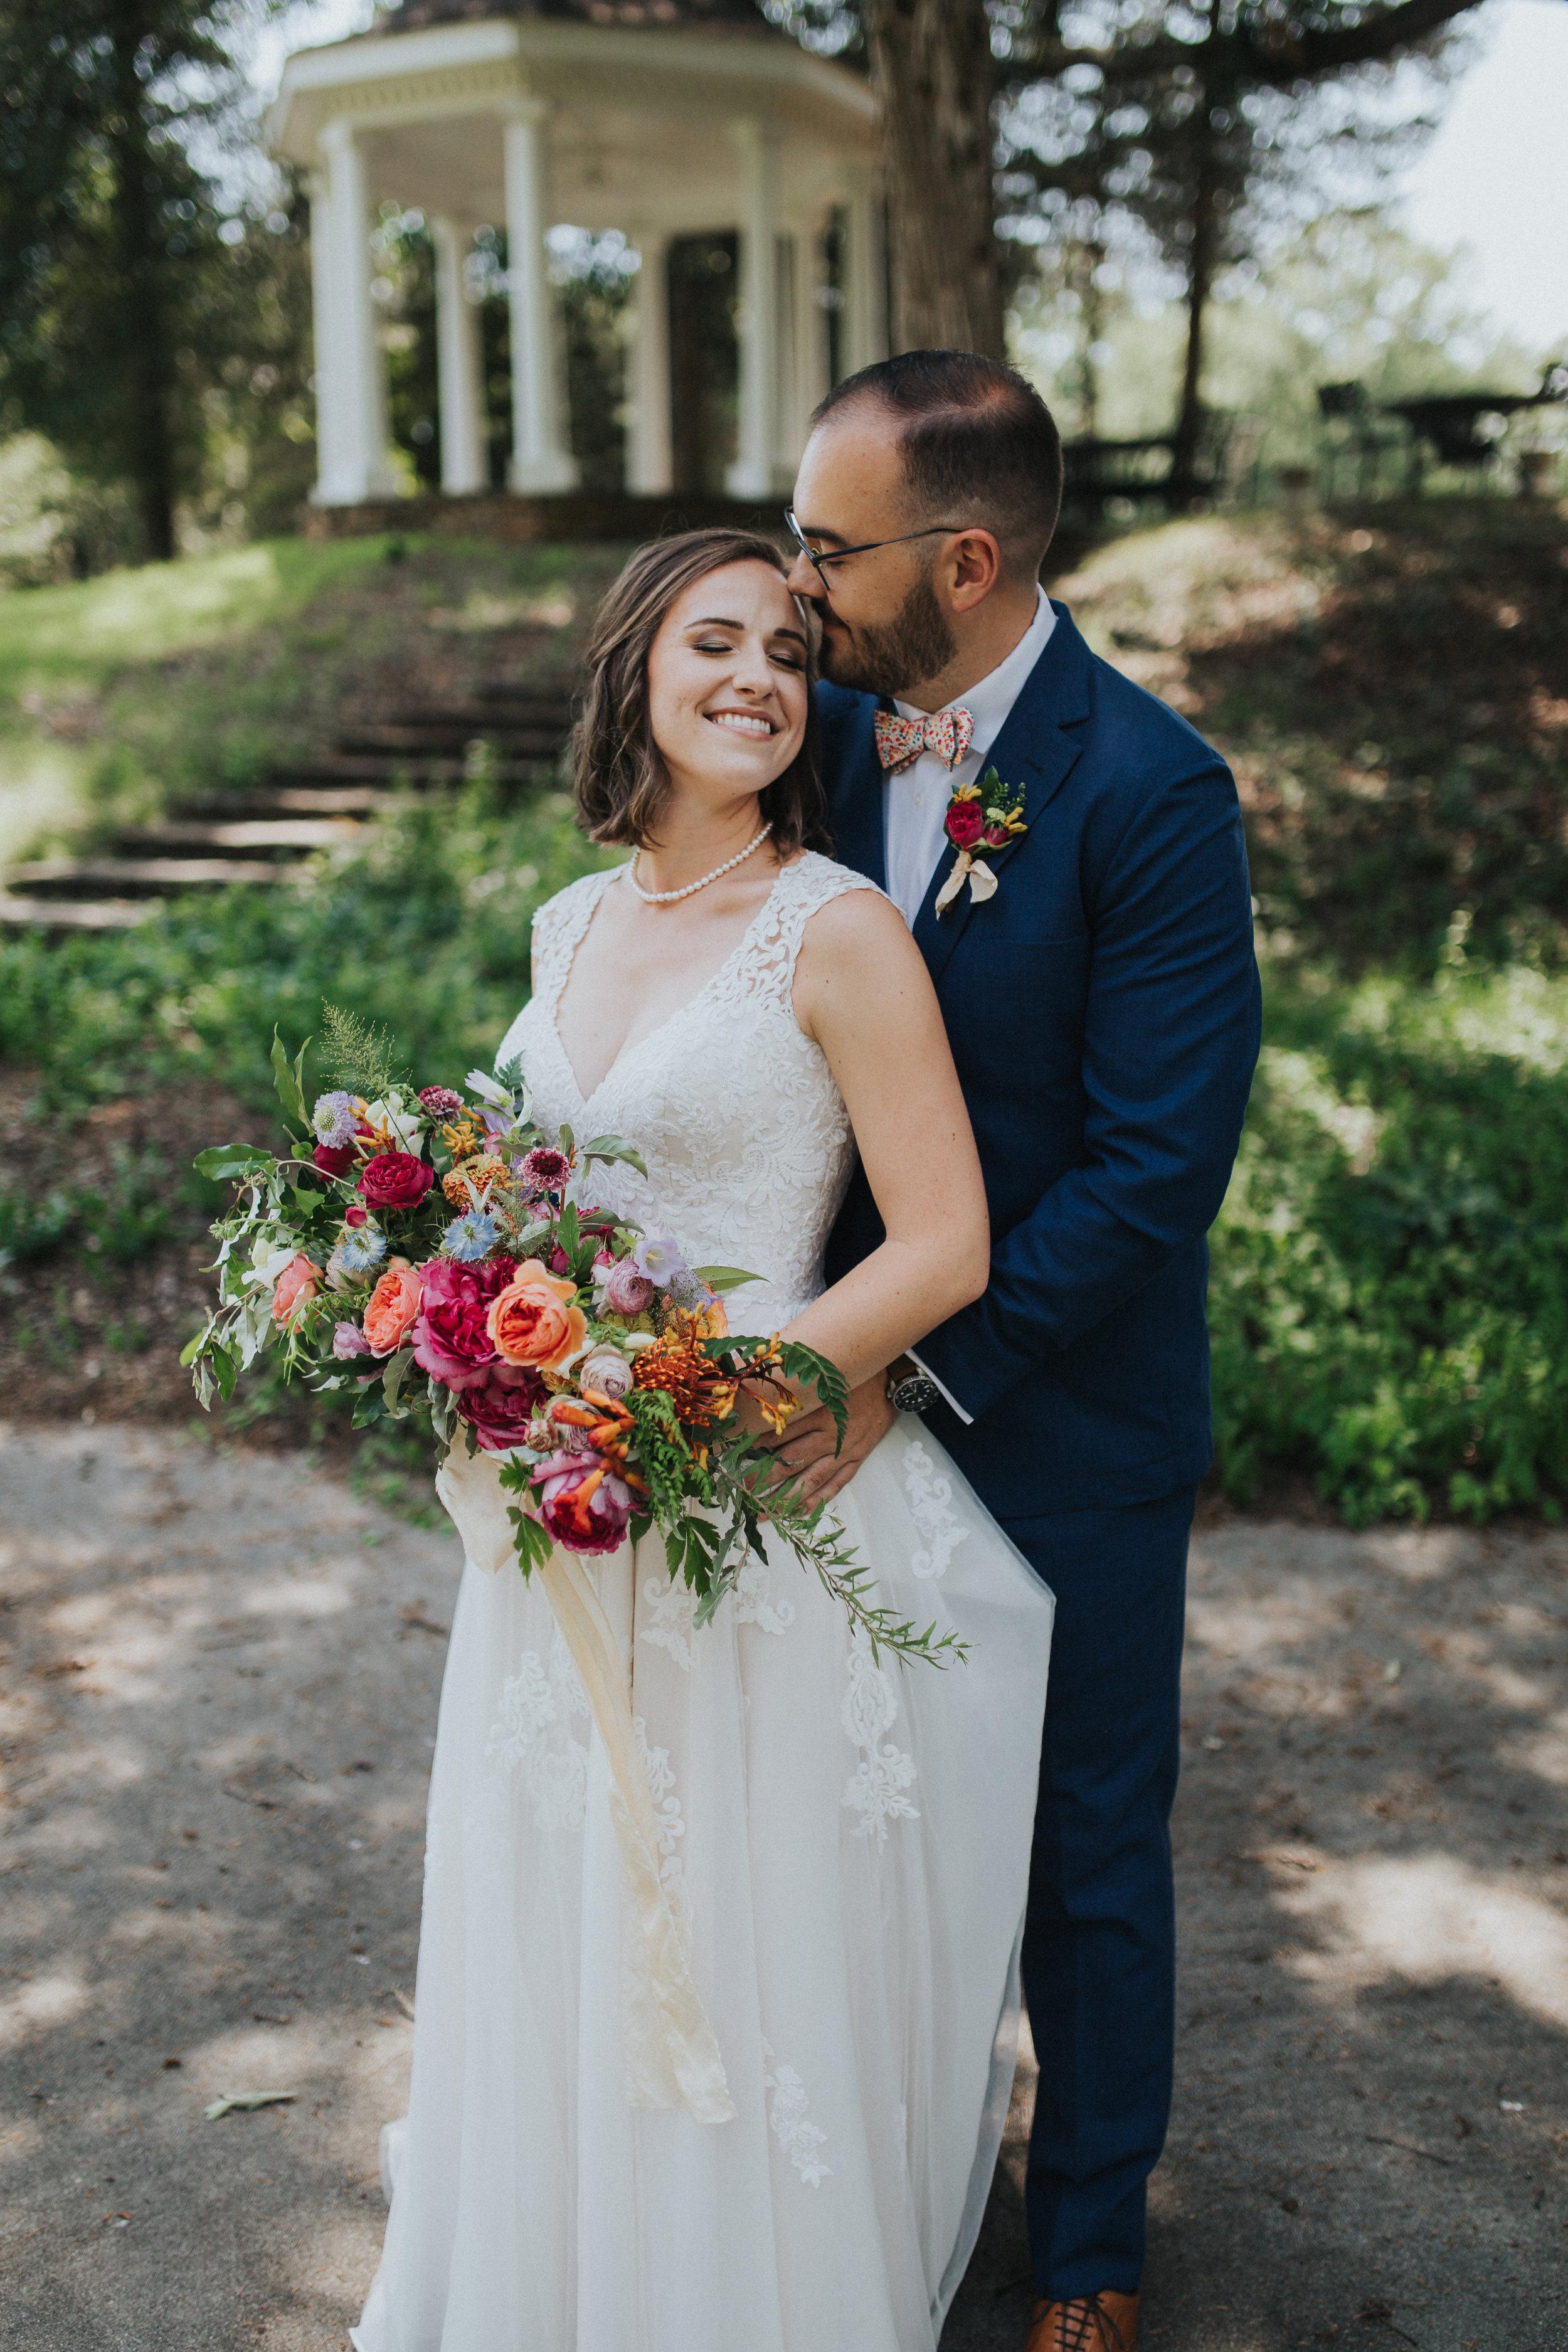 BRADFORD WEDDING 06.16.18-171.jpg